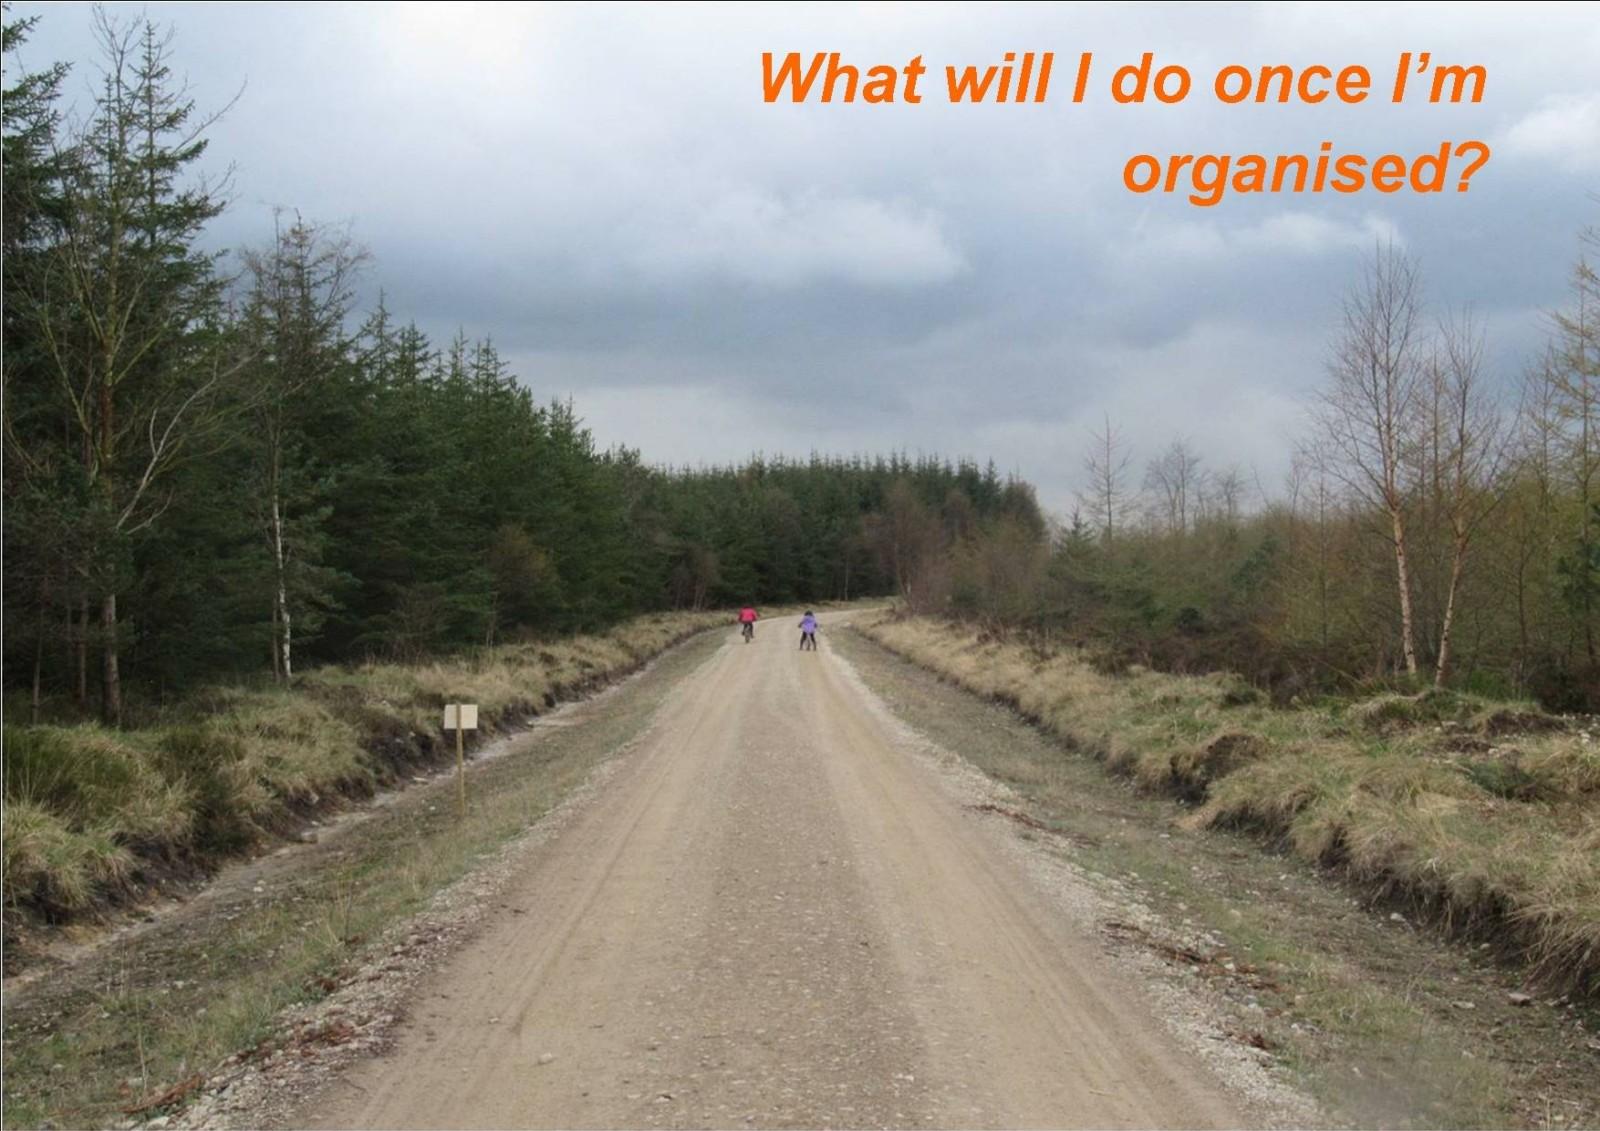 Once I'm organised...